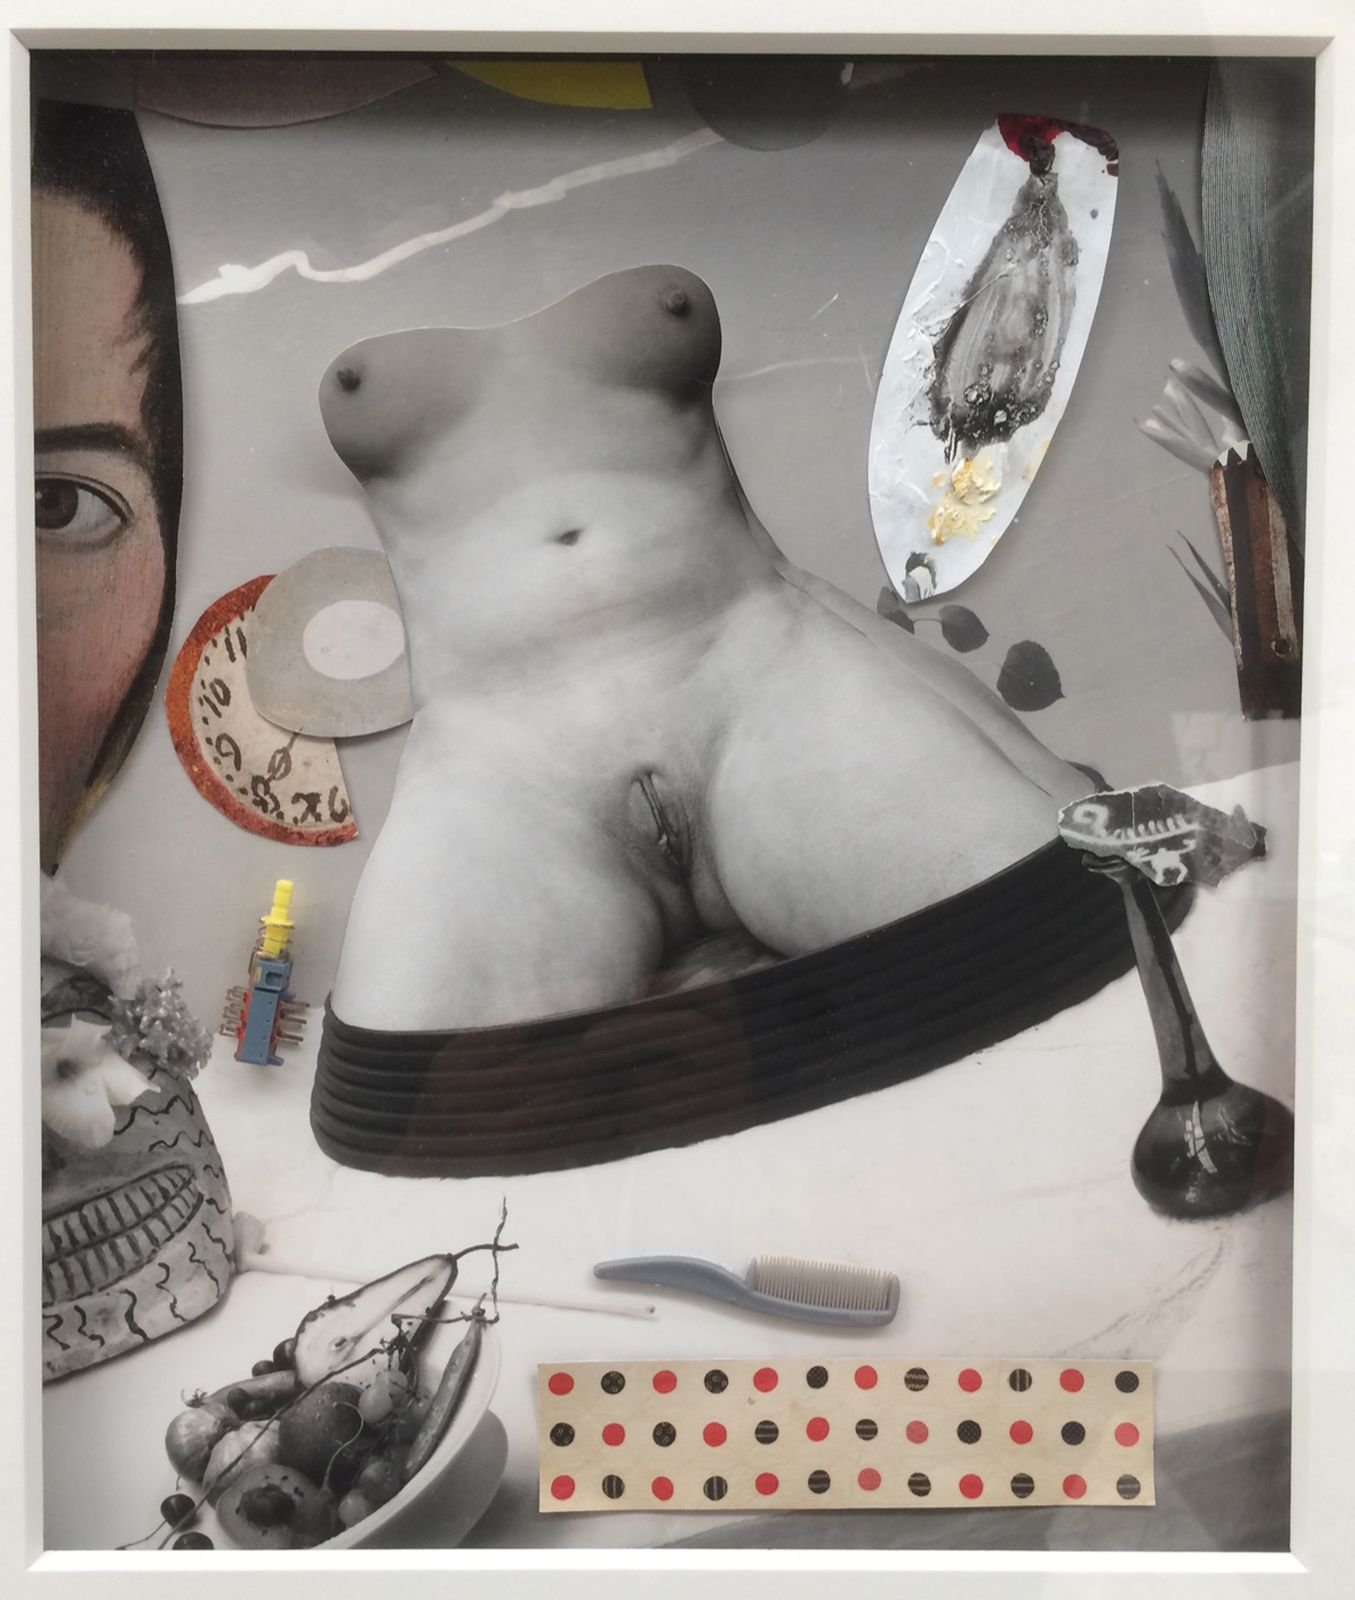 Joel-Peter Witkin - Courtesy Galerie Baudoin Lebon